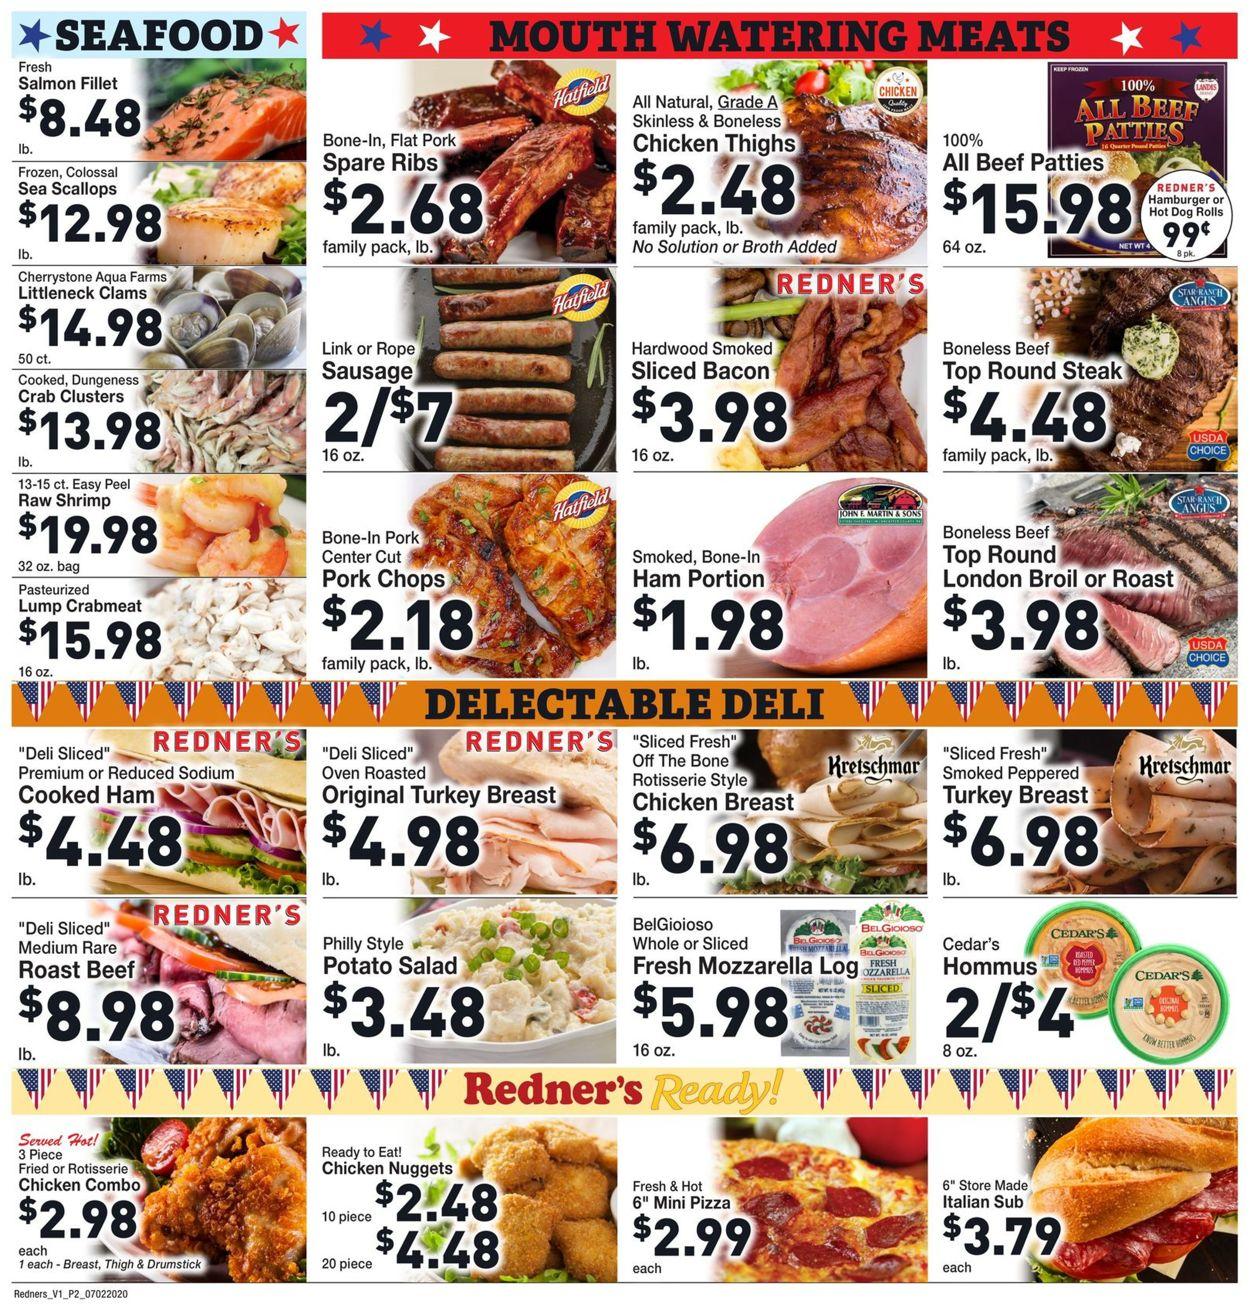 Redner's Warehouse Market Weekly Ad Circular - valid 07/02-07/08/2020 (Page 4)